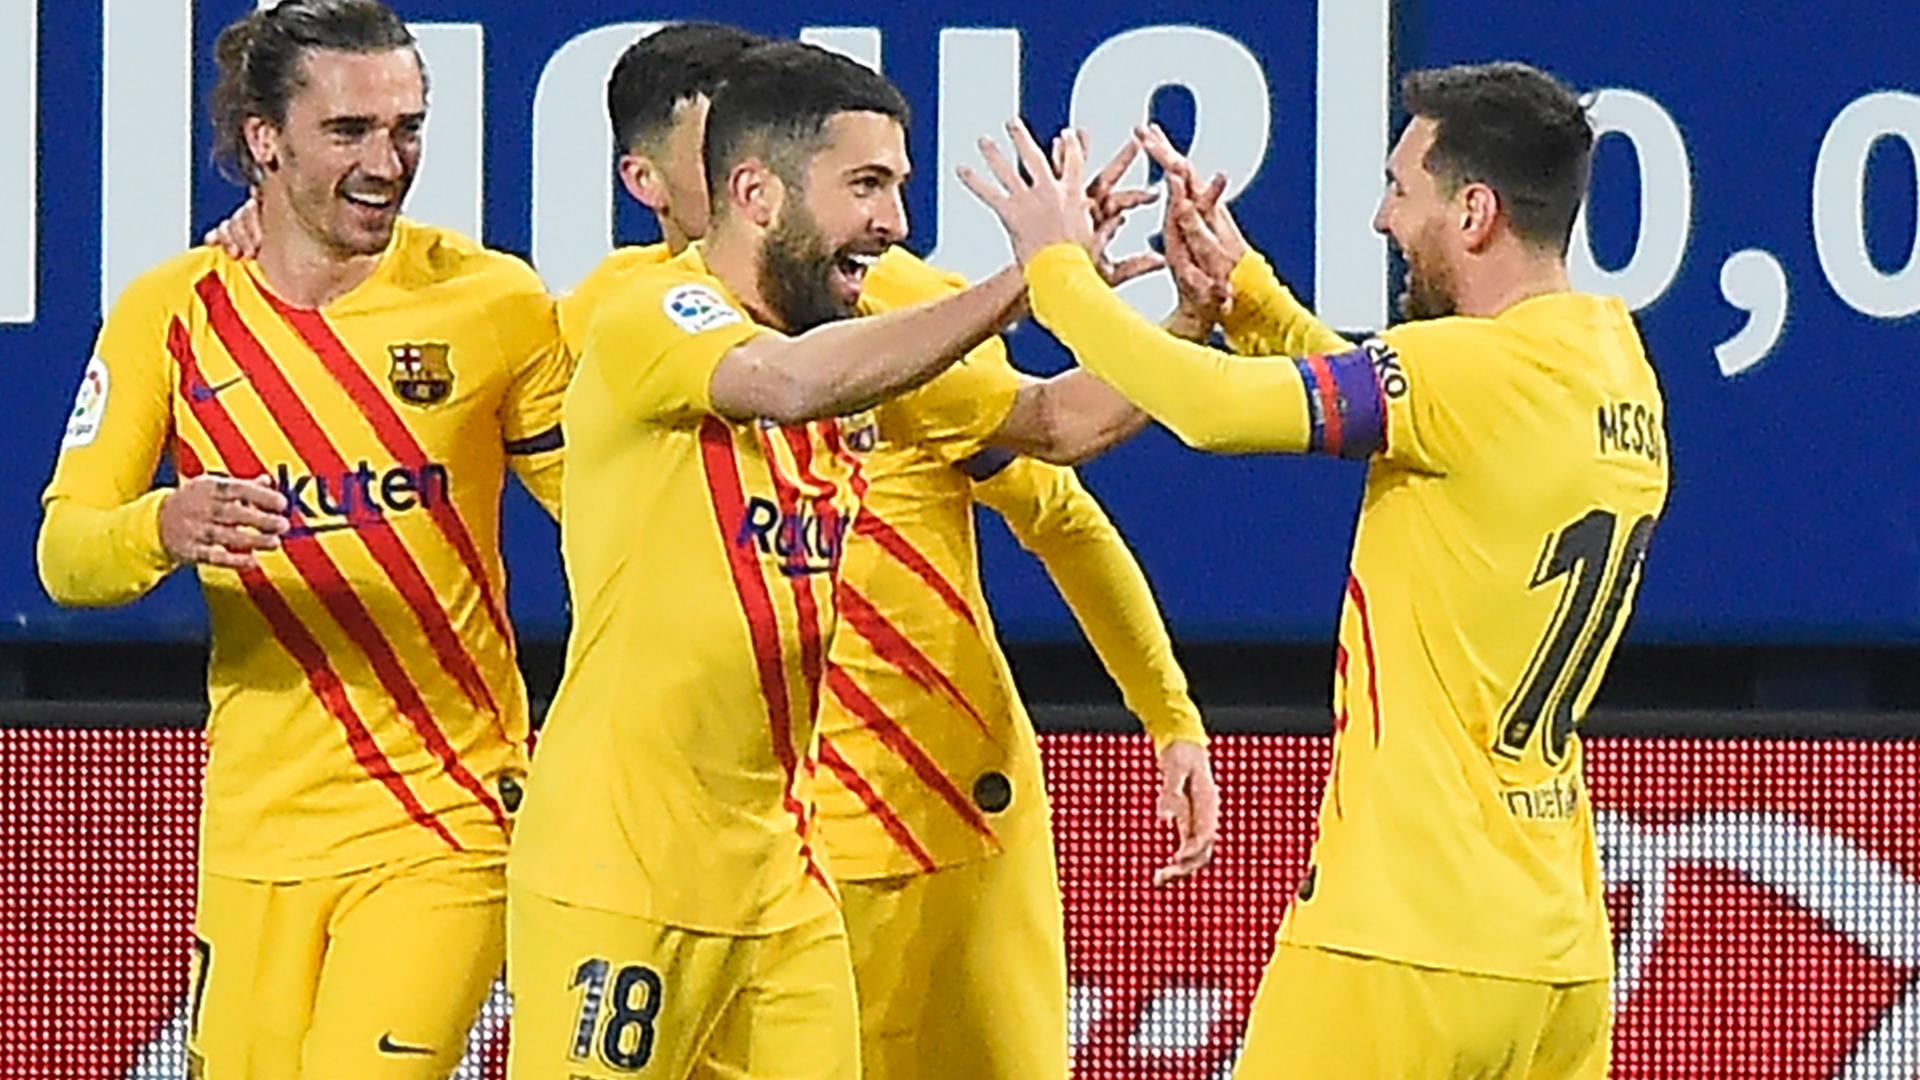 Messi-Alba combination is almost unstoppable – Koeman